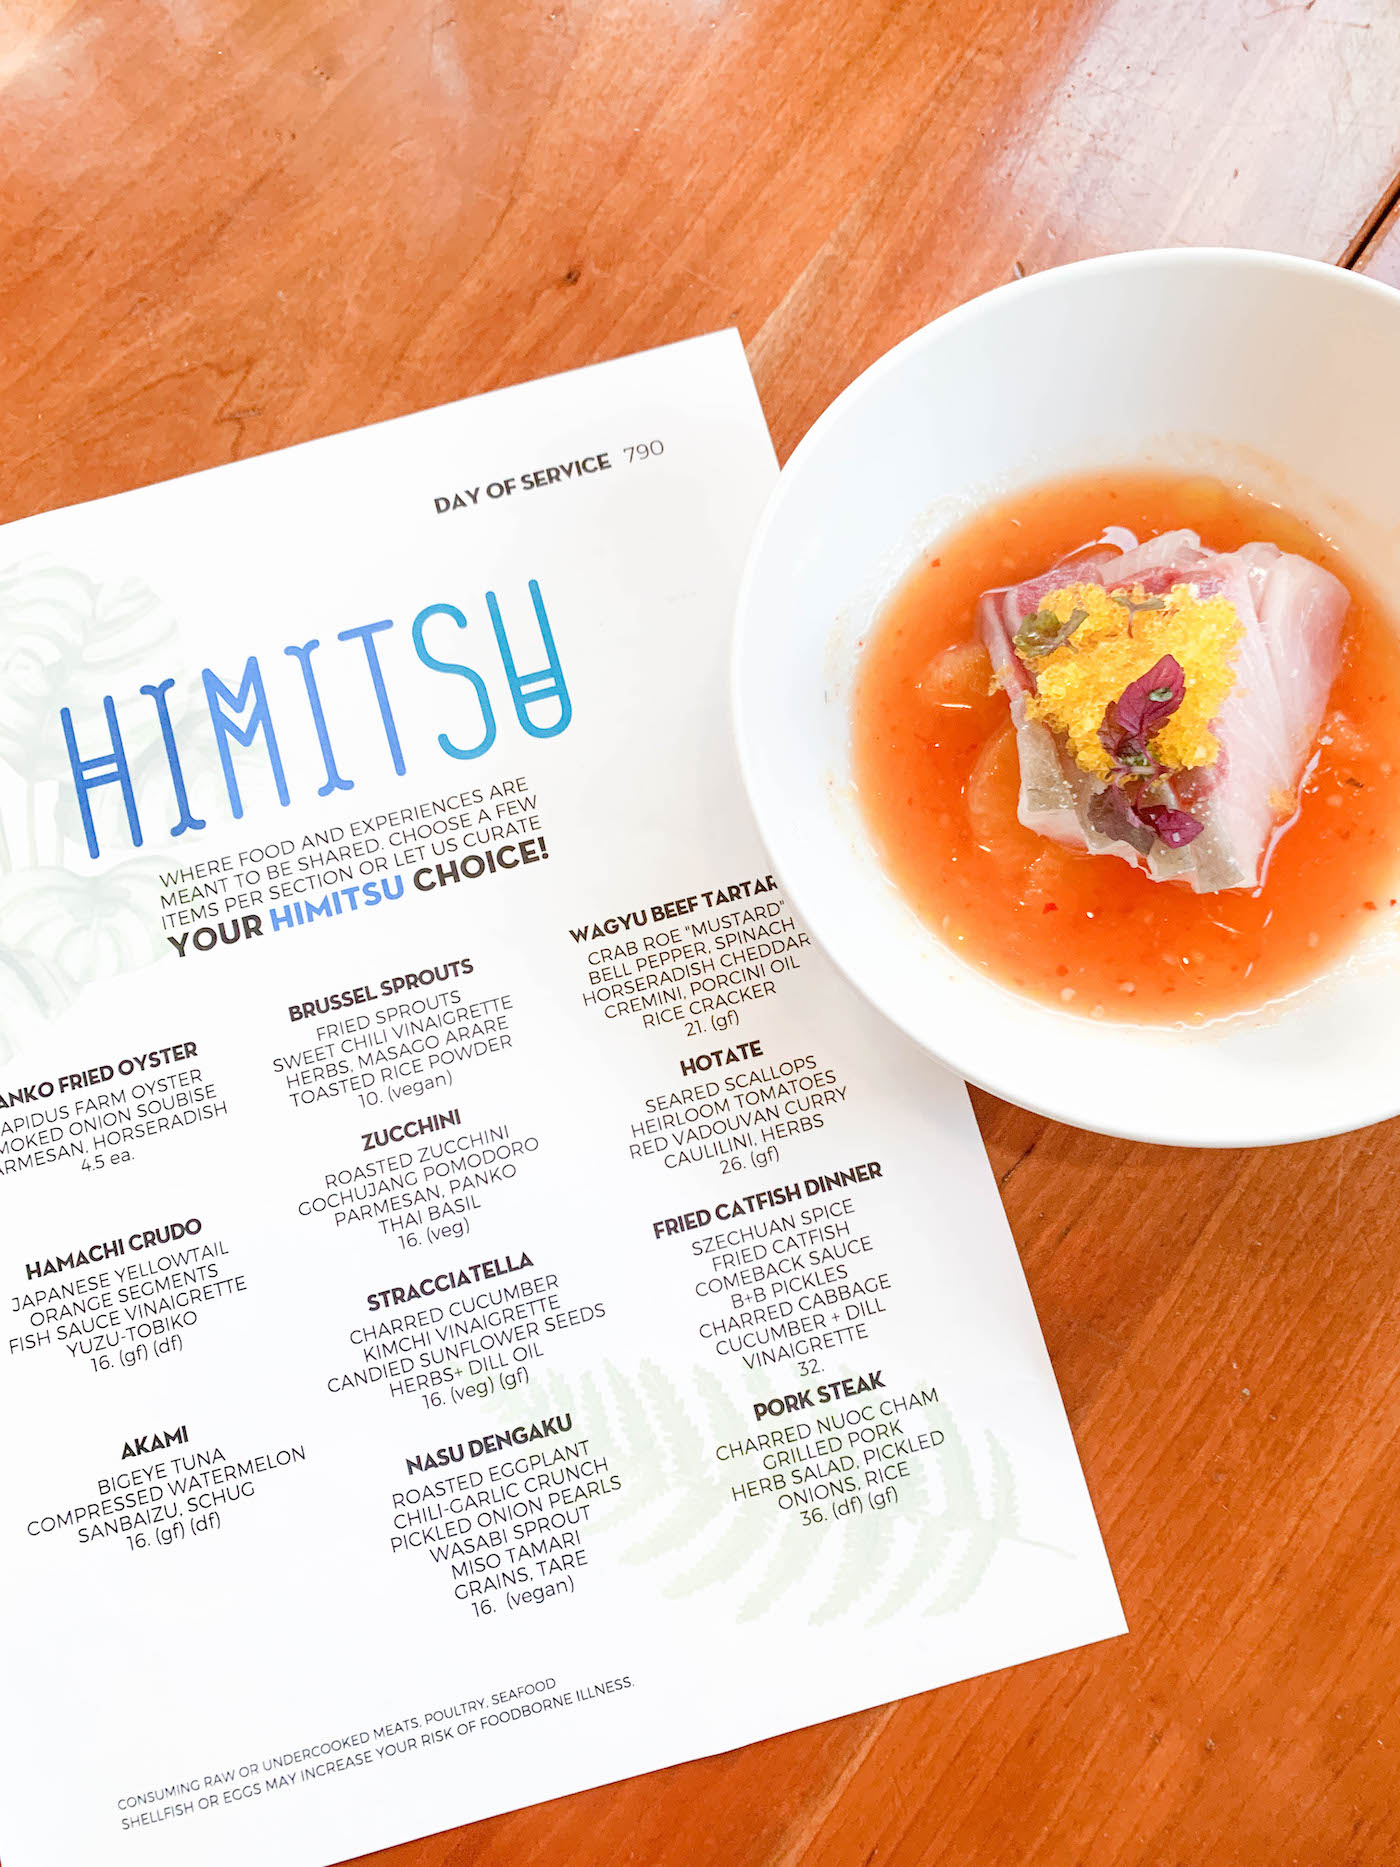 himitsu dc review